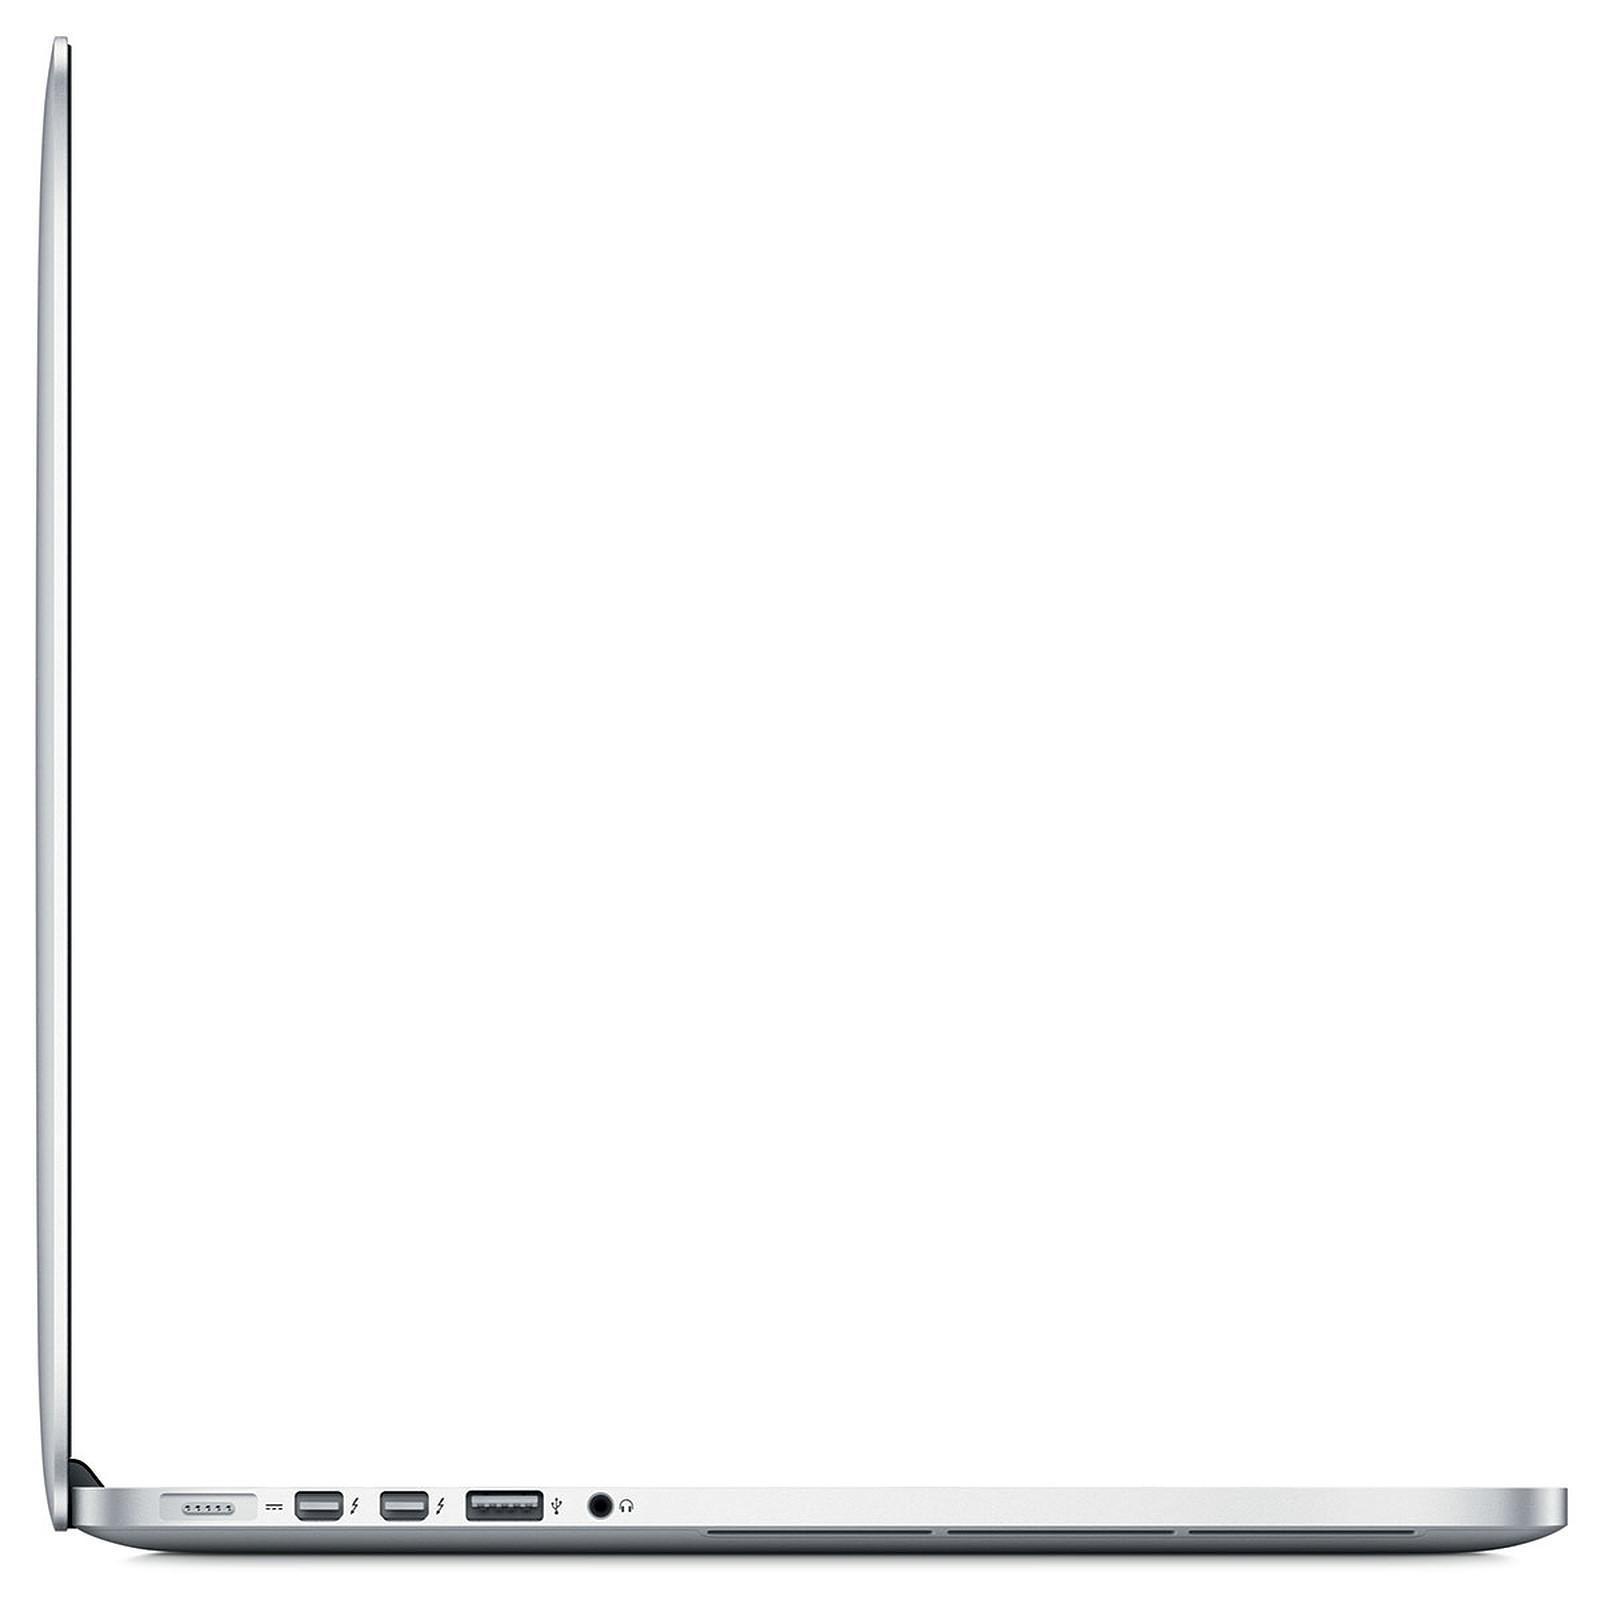 "MacBook Pro Retina 15,4"" (2014) - Core i7 - 16GB - SSD 1000 GB QWERTY - Anglická (US)"